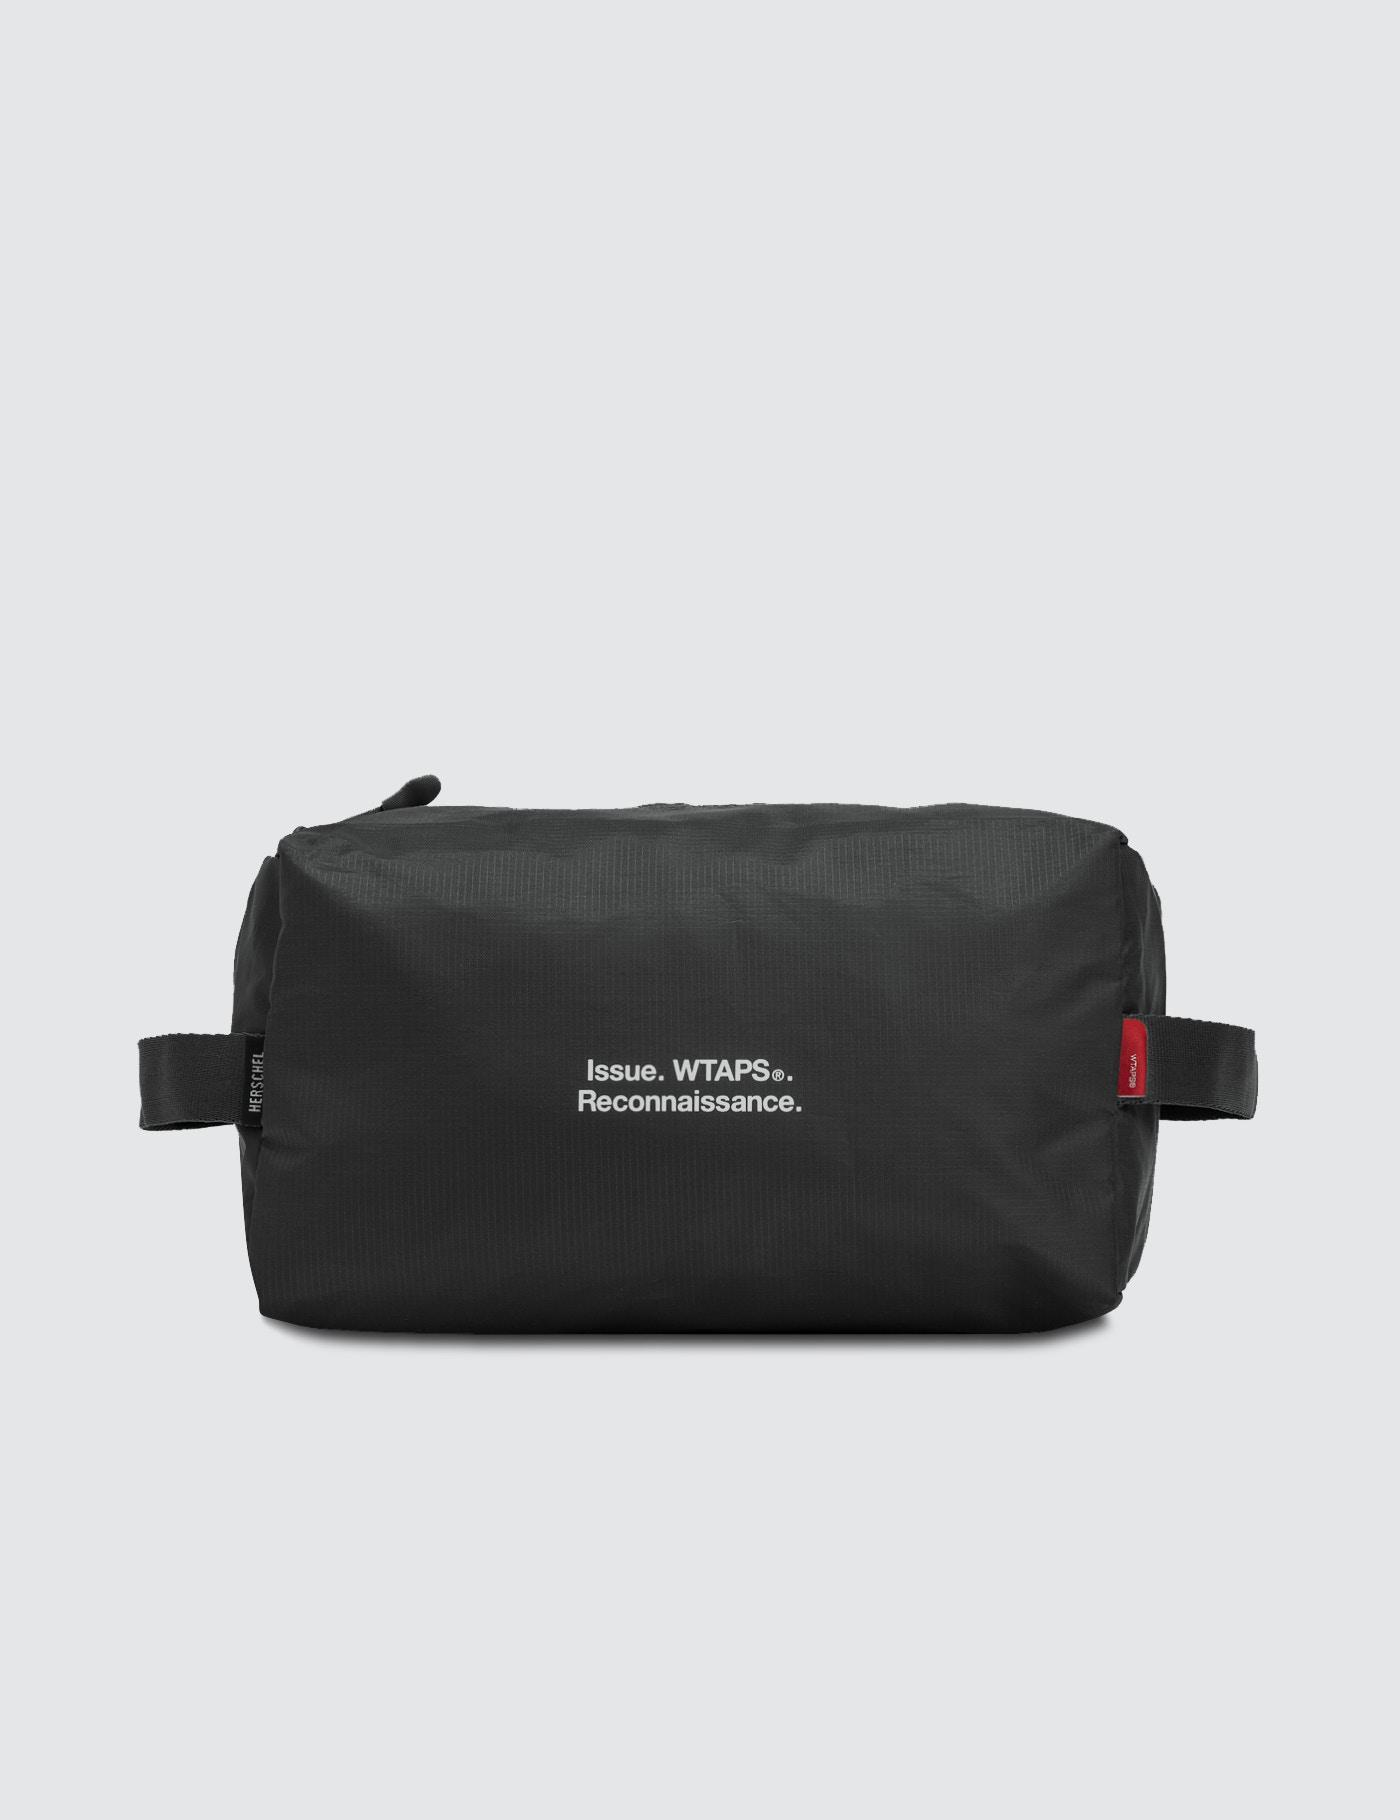 4265e12b362a Lyst - Herschel Supply Co. Wtaps X W-382 Toiletry Bag in Black for Men